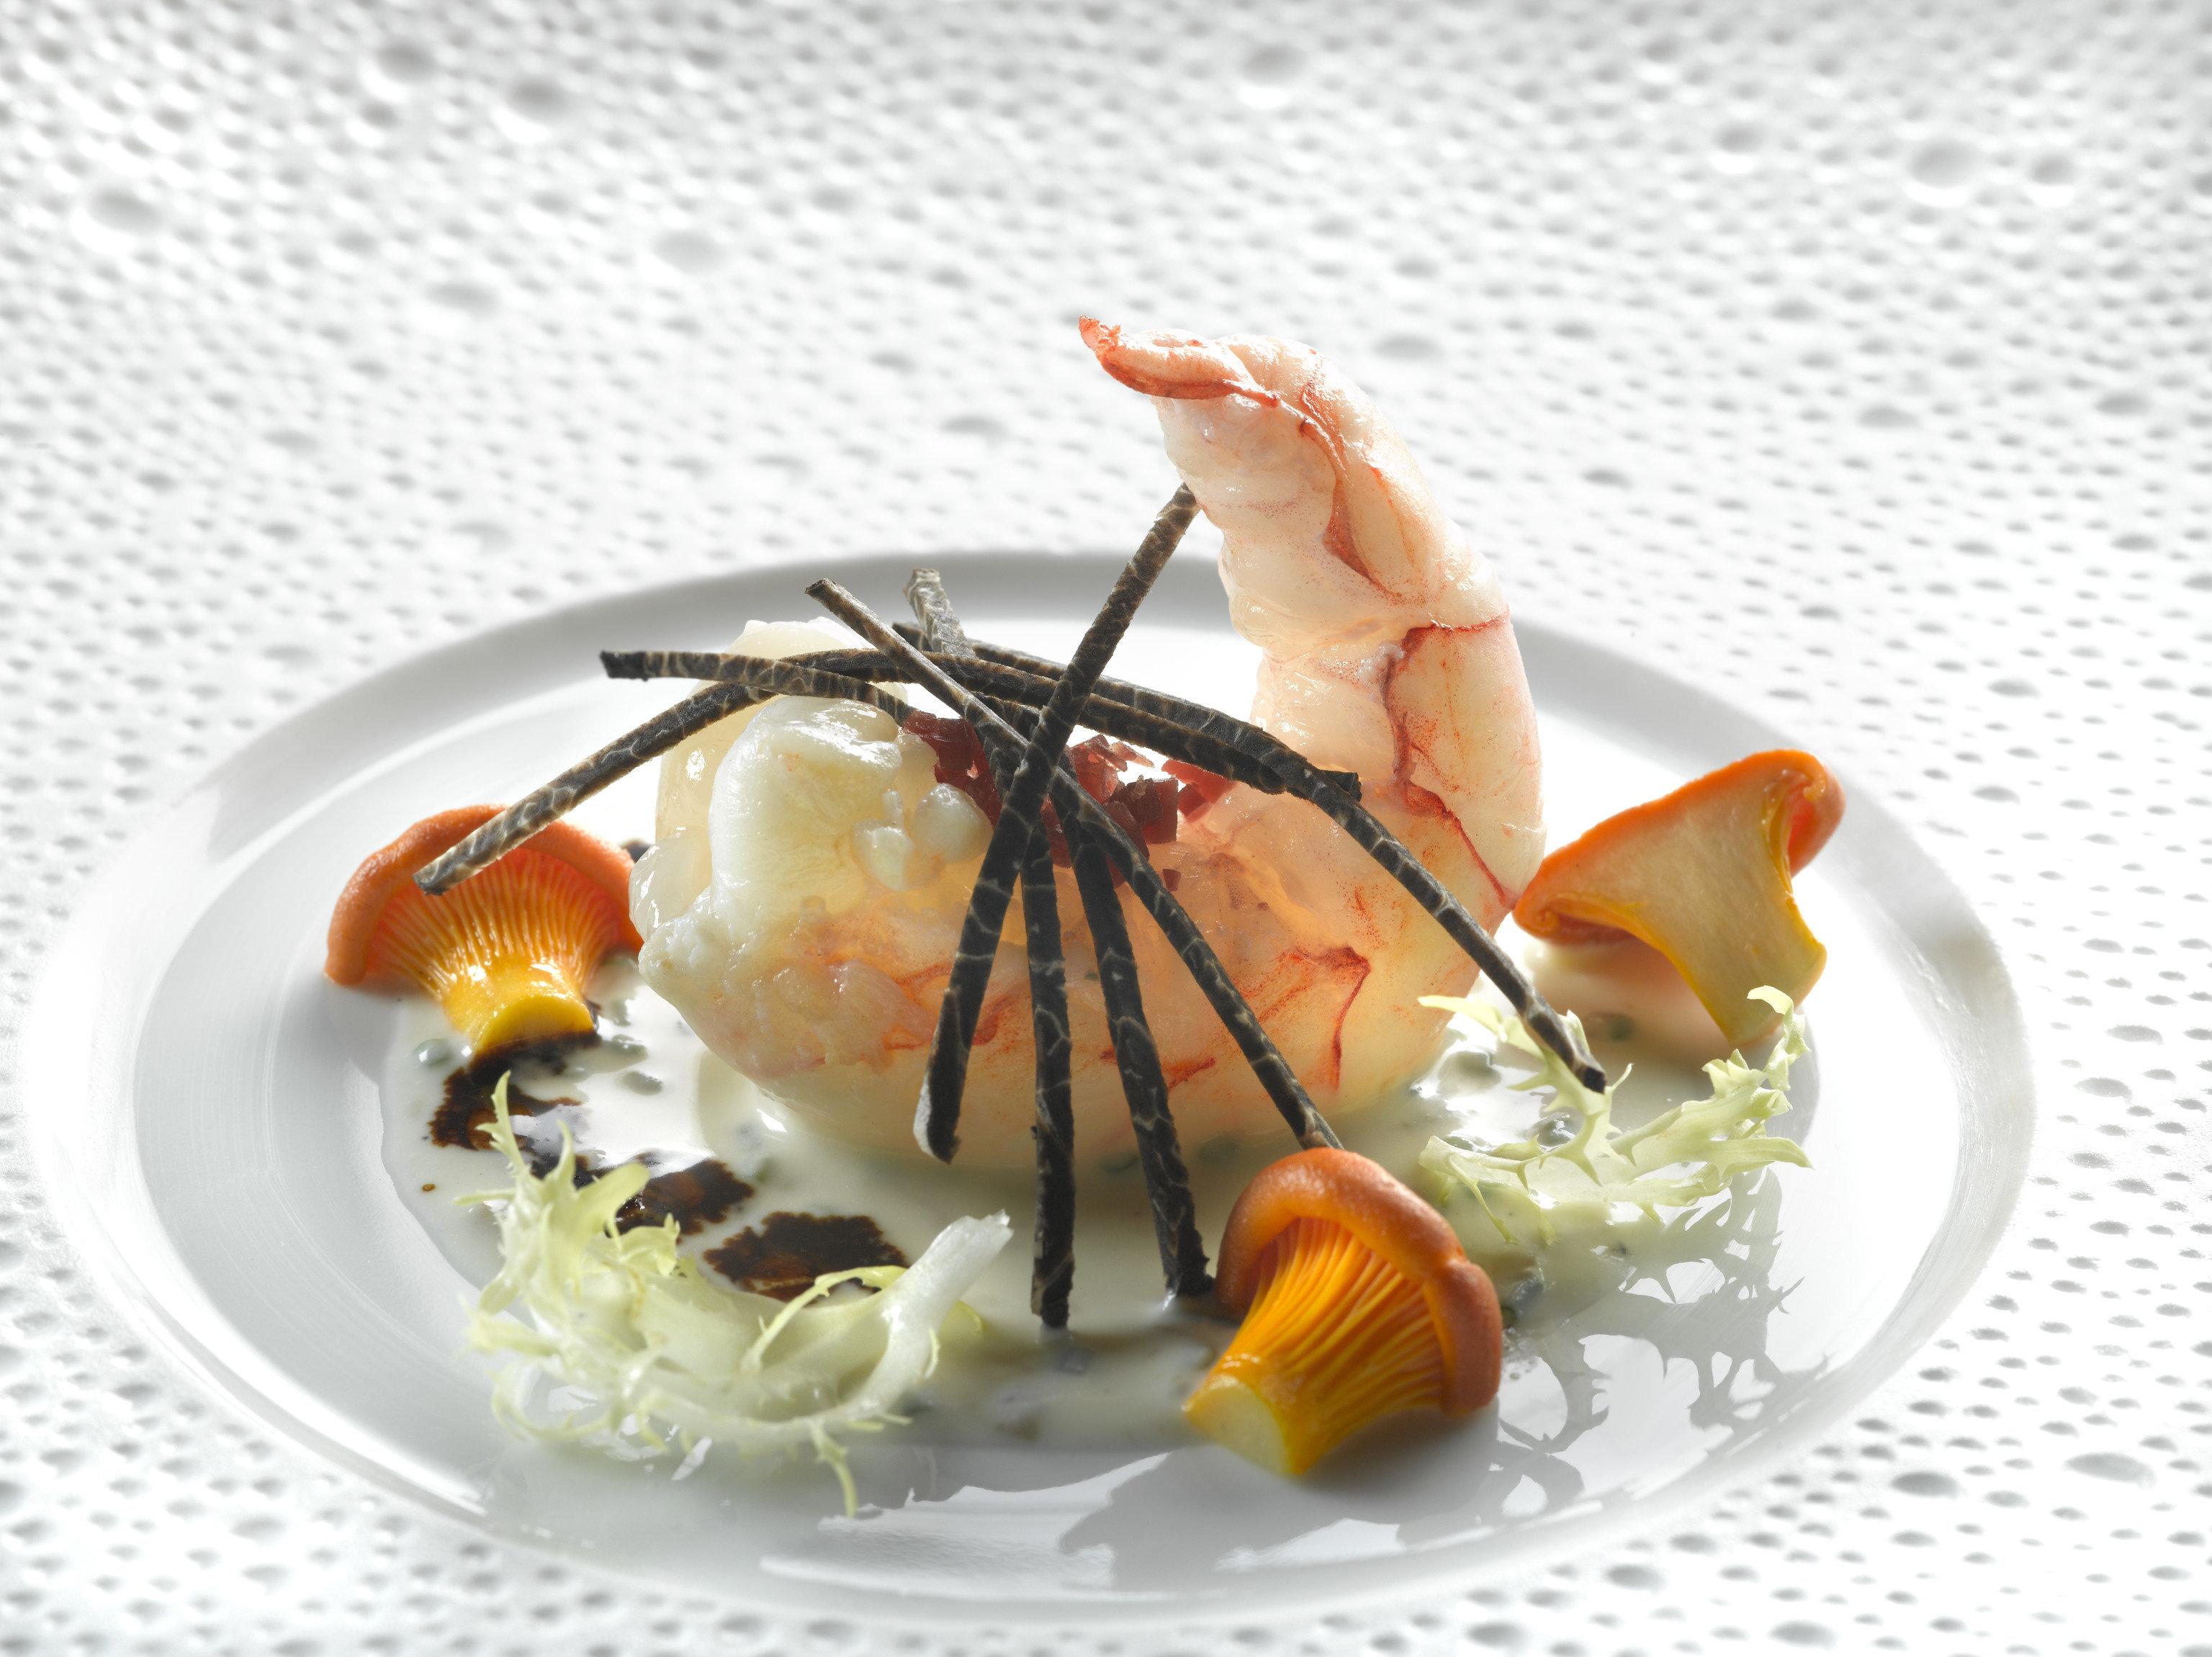 Food + Drink plate food dish piece dessert slice cuisine white Seafood garnish fork recipe meal eaten